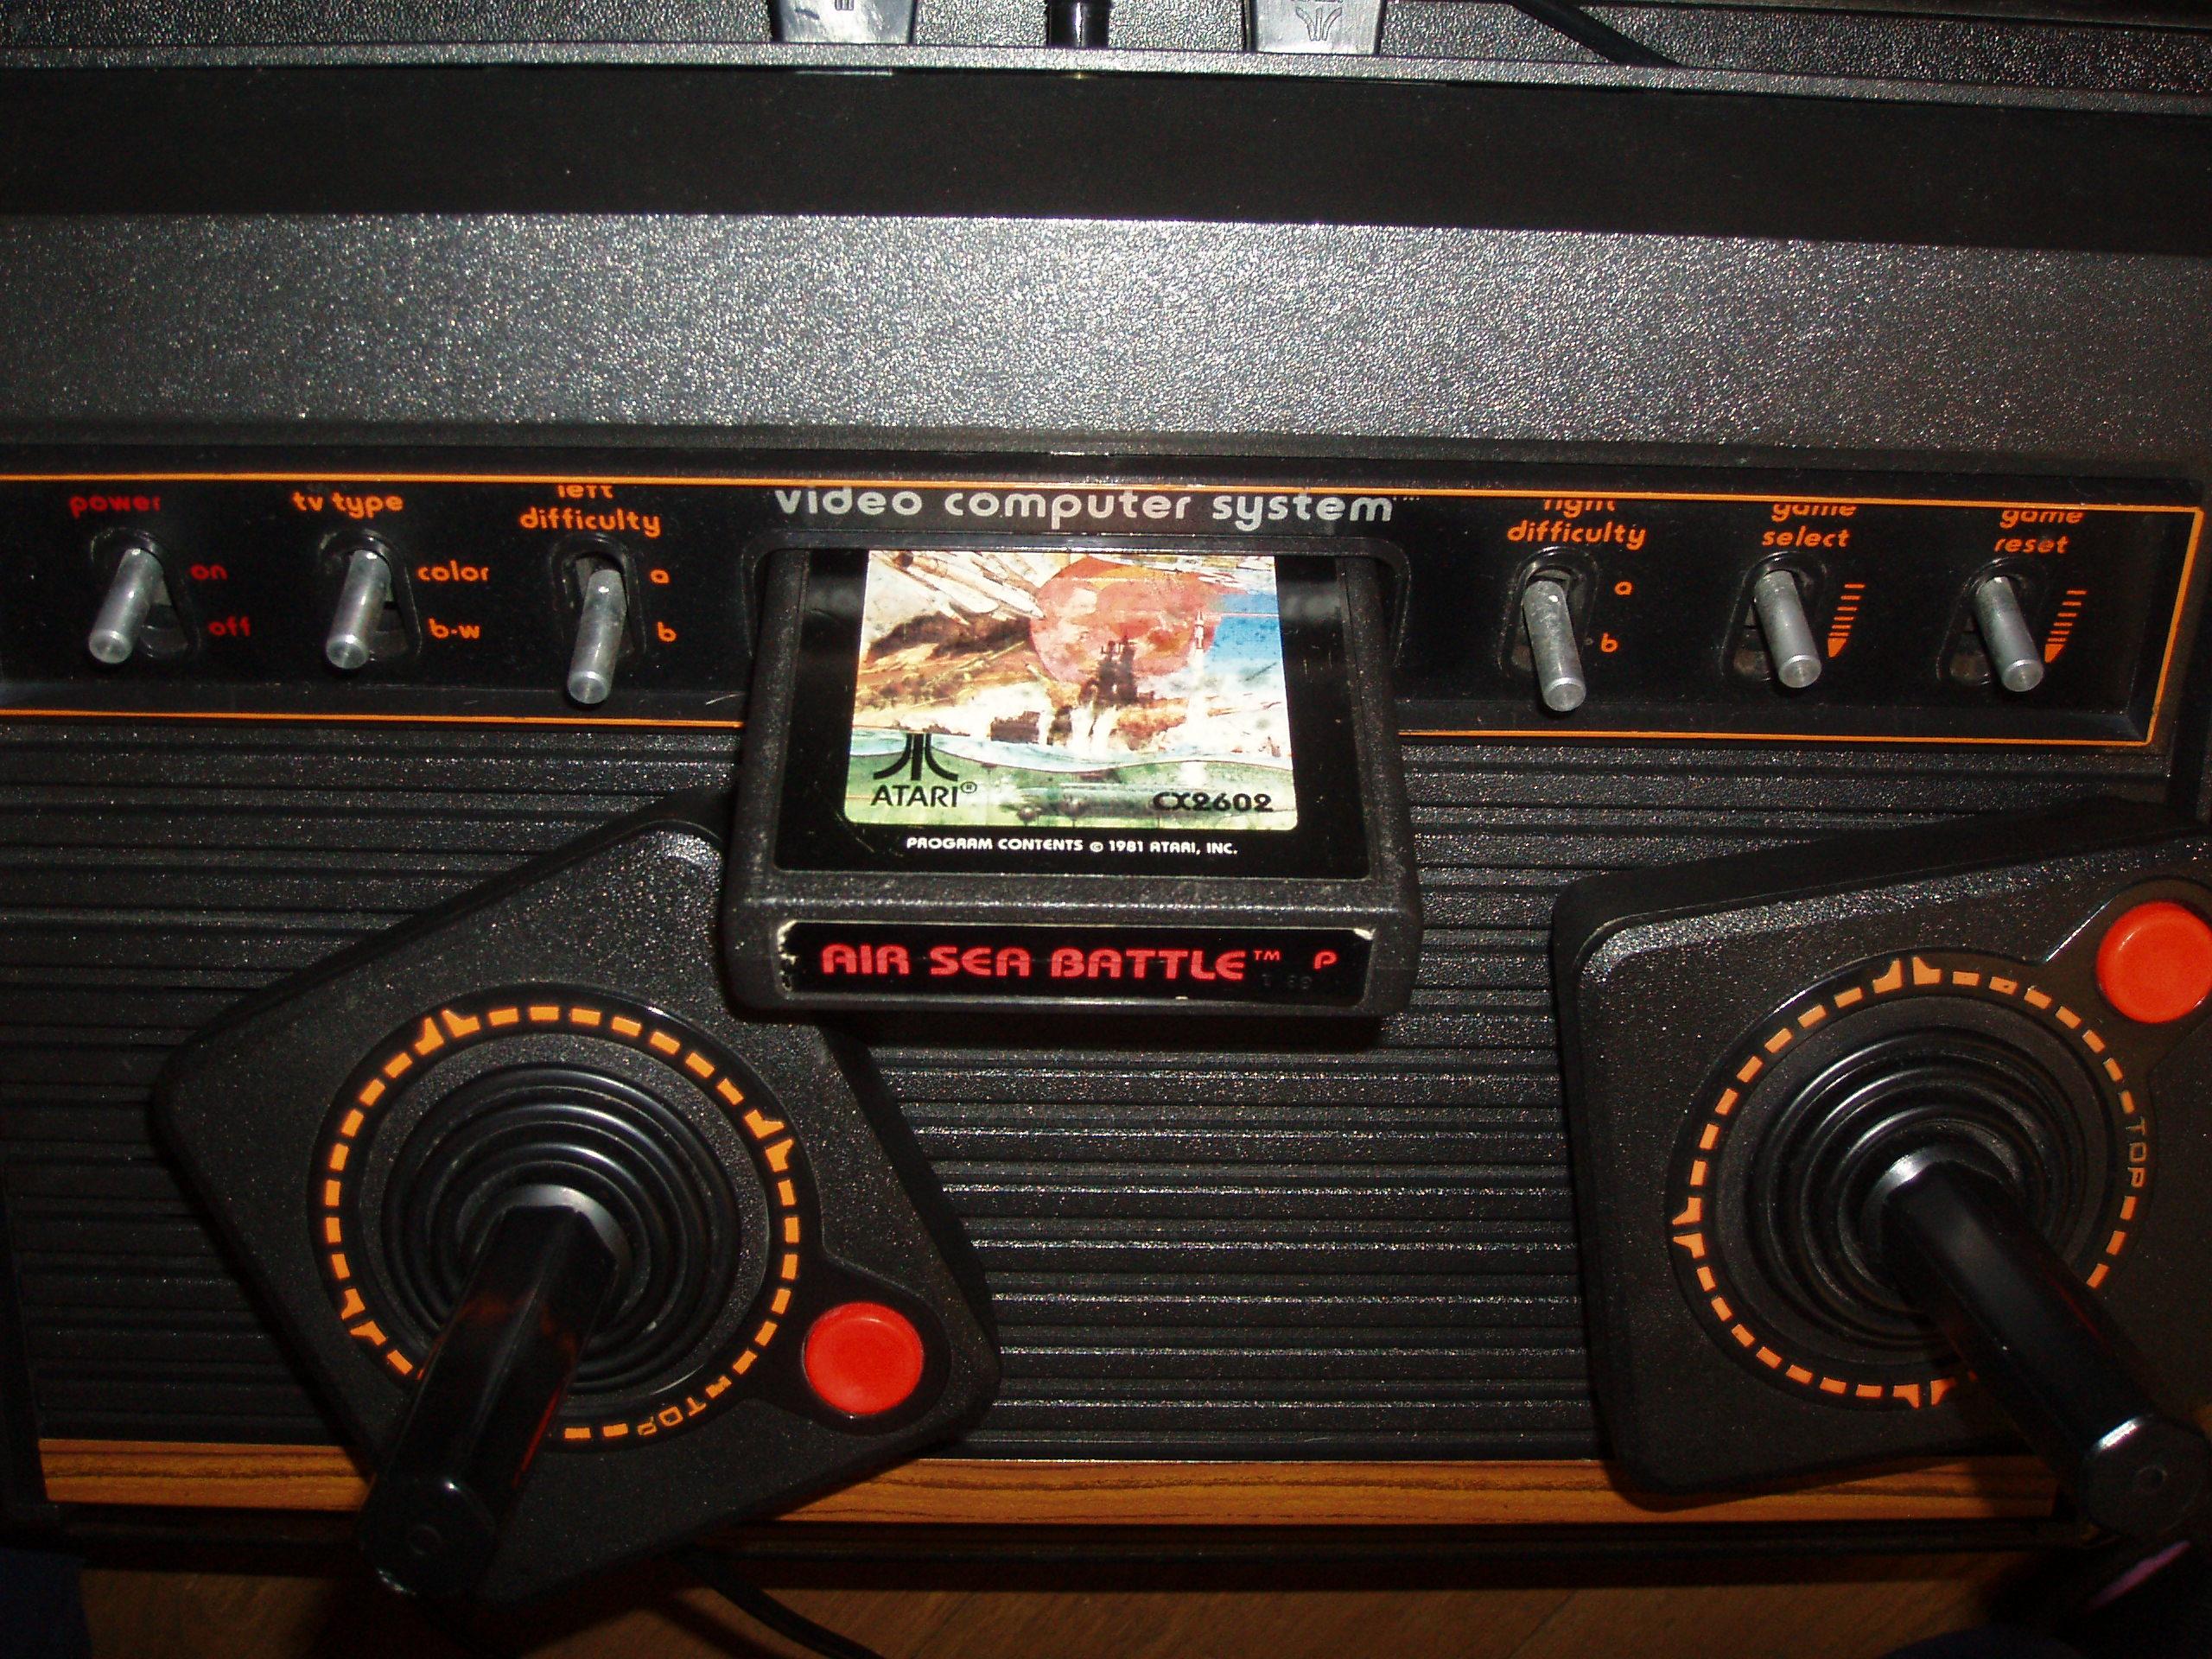 atari2600forever: Air-Sea Battle (Atari 2600 Novice/B) 34 points on 2018-04-03 03:19:34